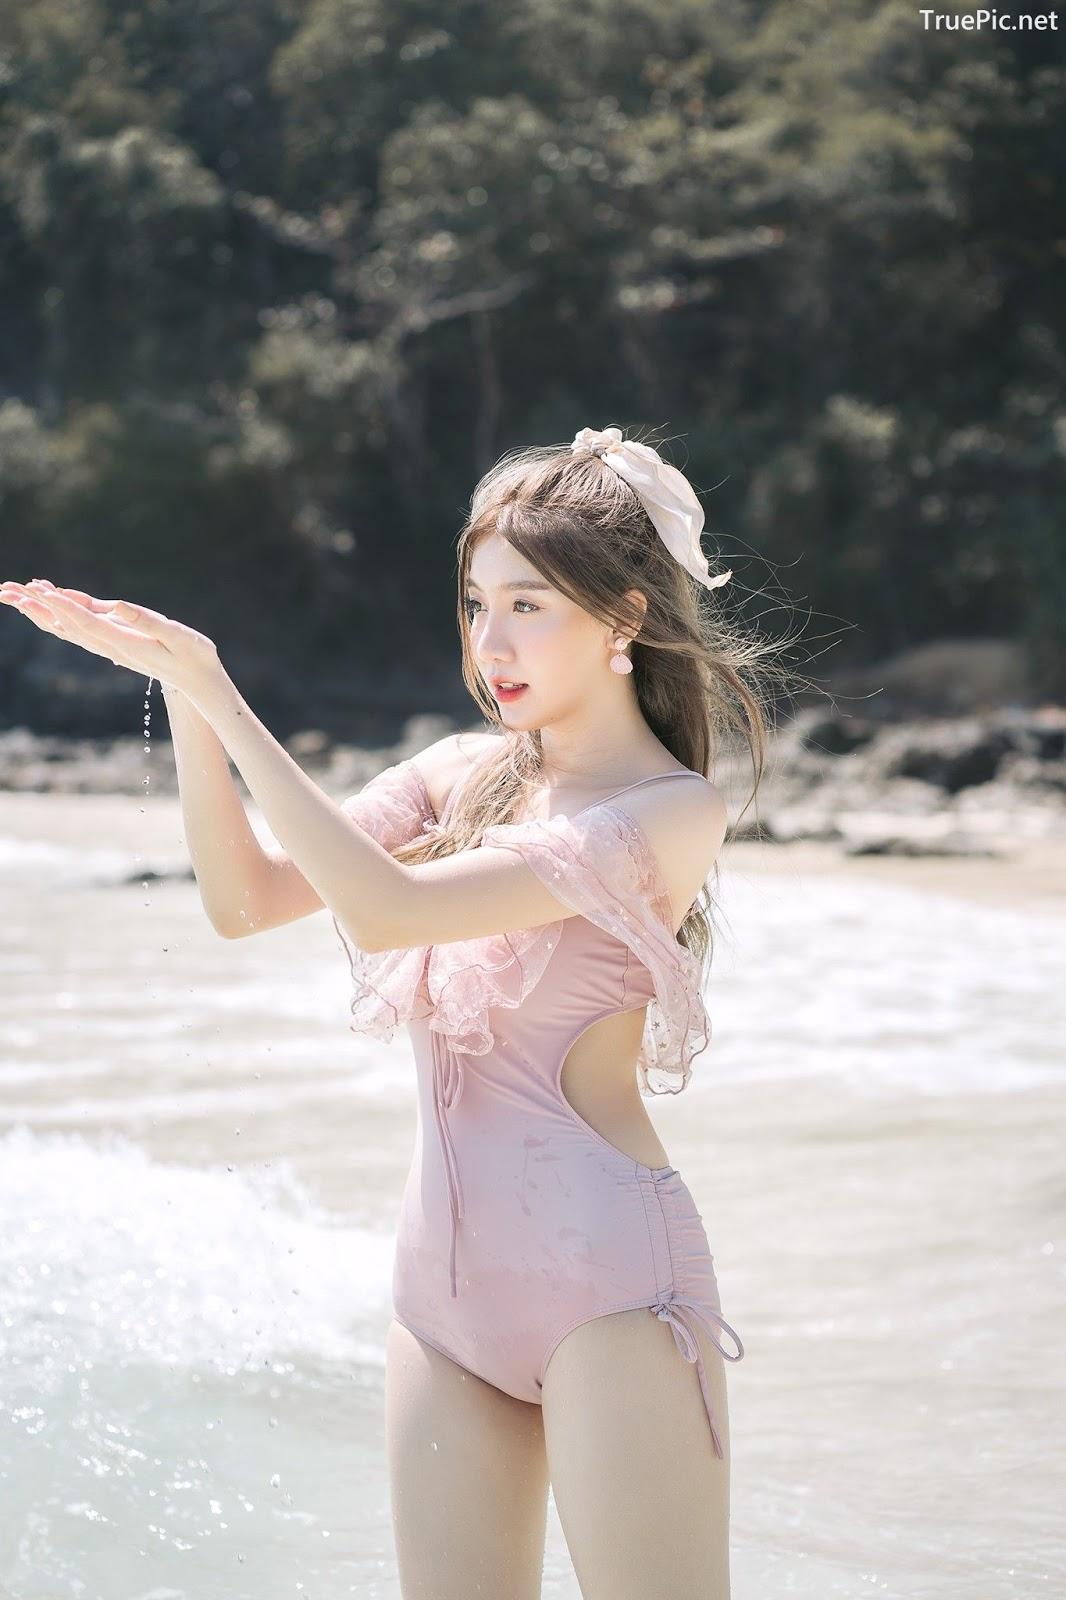 Image Thailand Model - Sasi Ngiunwan - Pink Monokini - TruePic.net - Picture-7